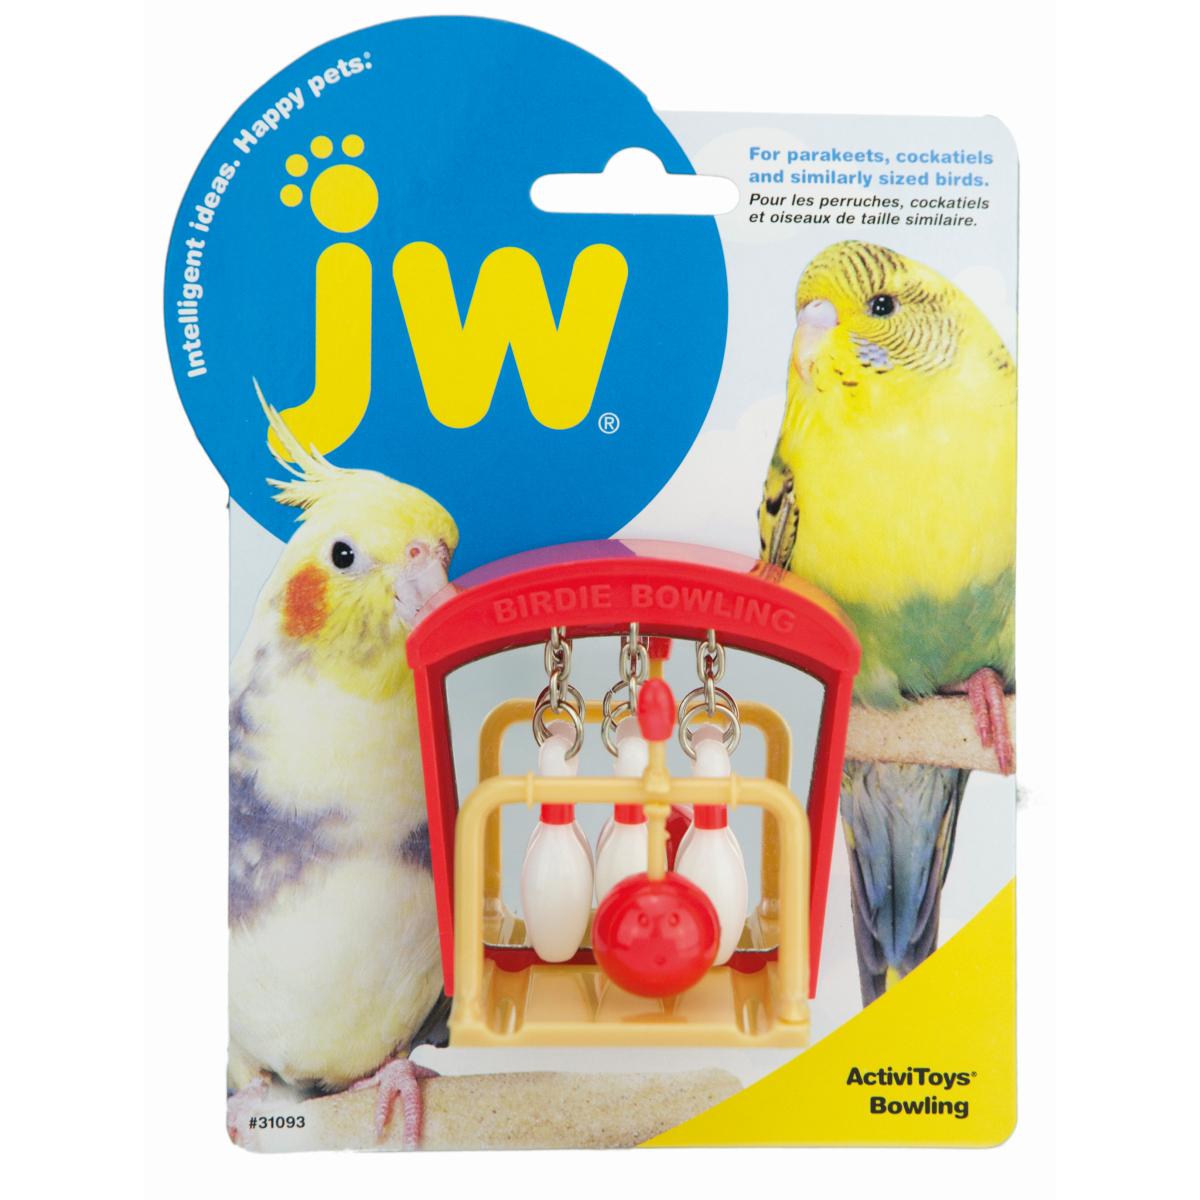 JW ACTIVITOY BIRDIE BOWLING 00001